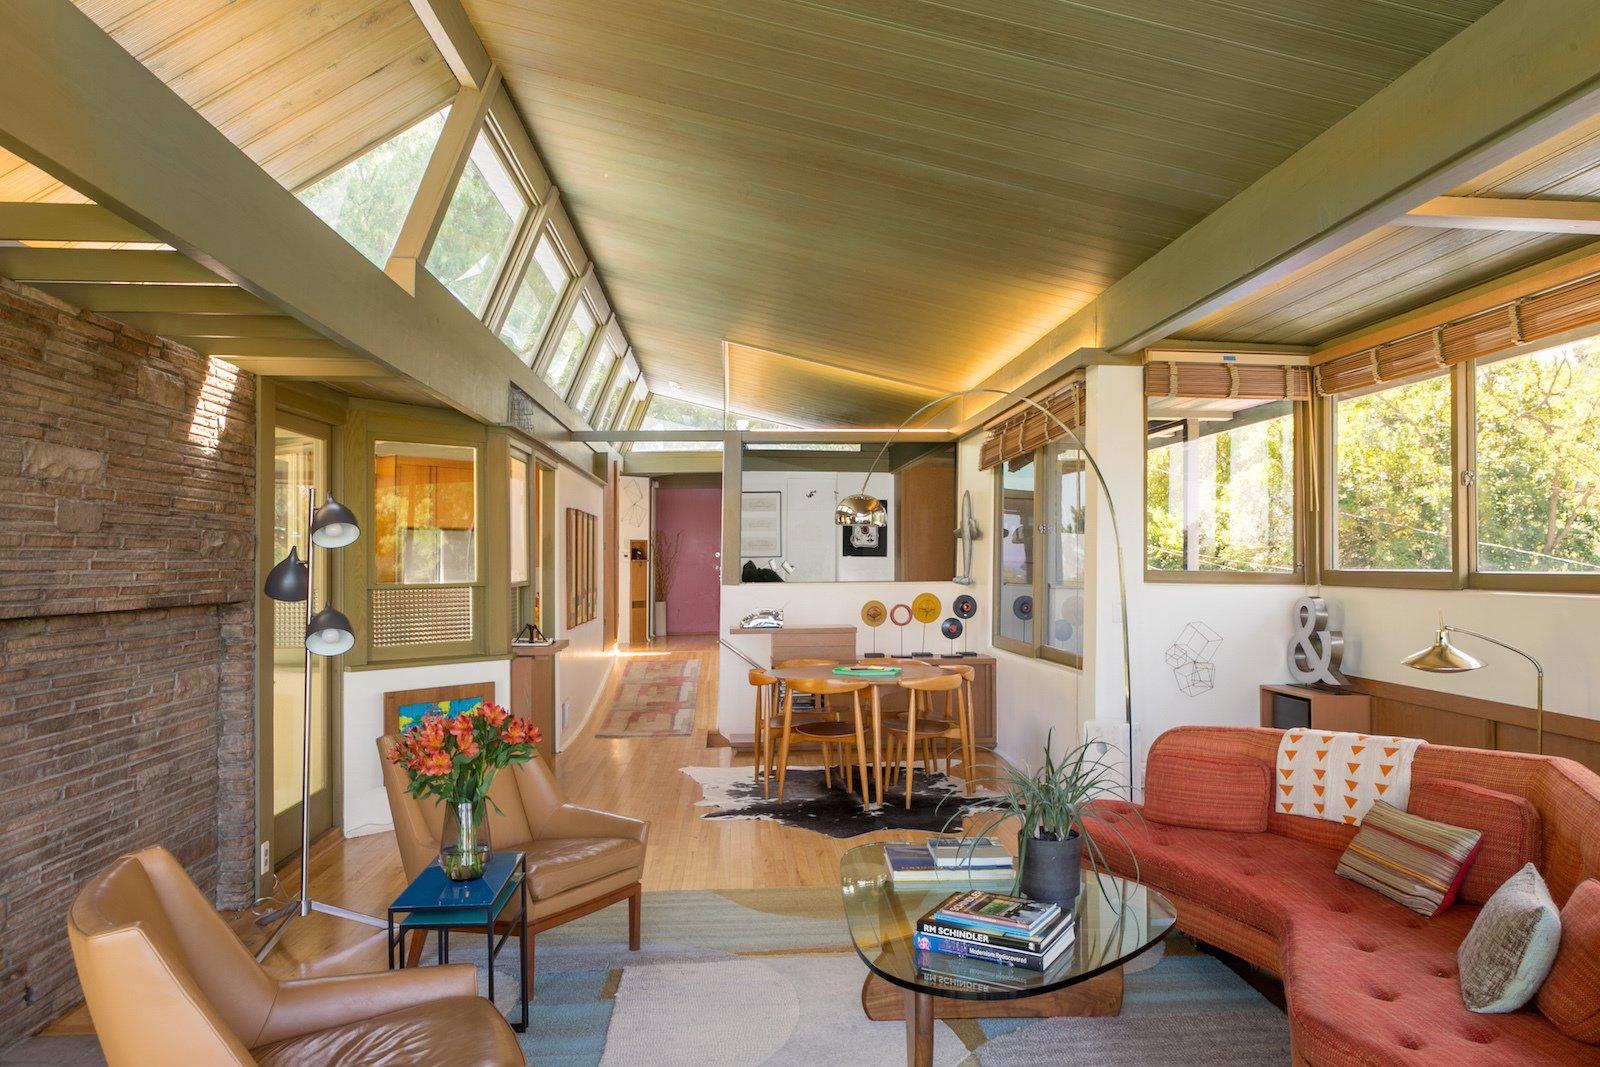 Living Room, Chair, Sofa, Coffee Tables, Floor Lighting, Medium Hardwood Floor, Rug Floor, and Standard Layout Fireplace  Photo 8 of 17 in A Midcentury Schindler Gem With a Writer's Studio Asks $2.3M